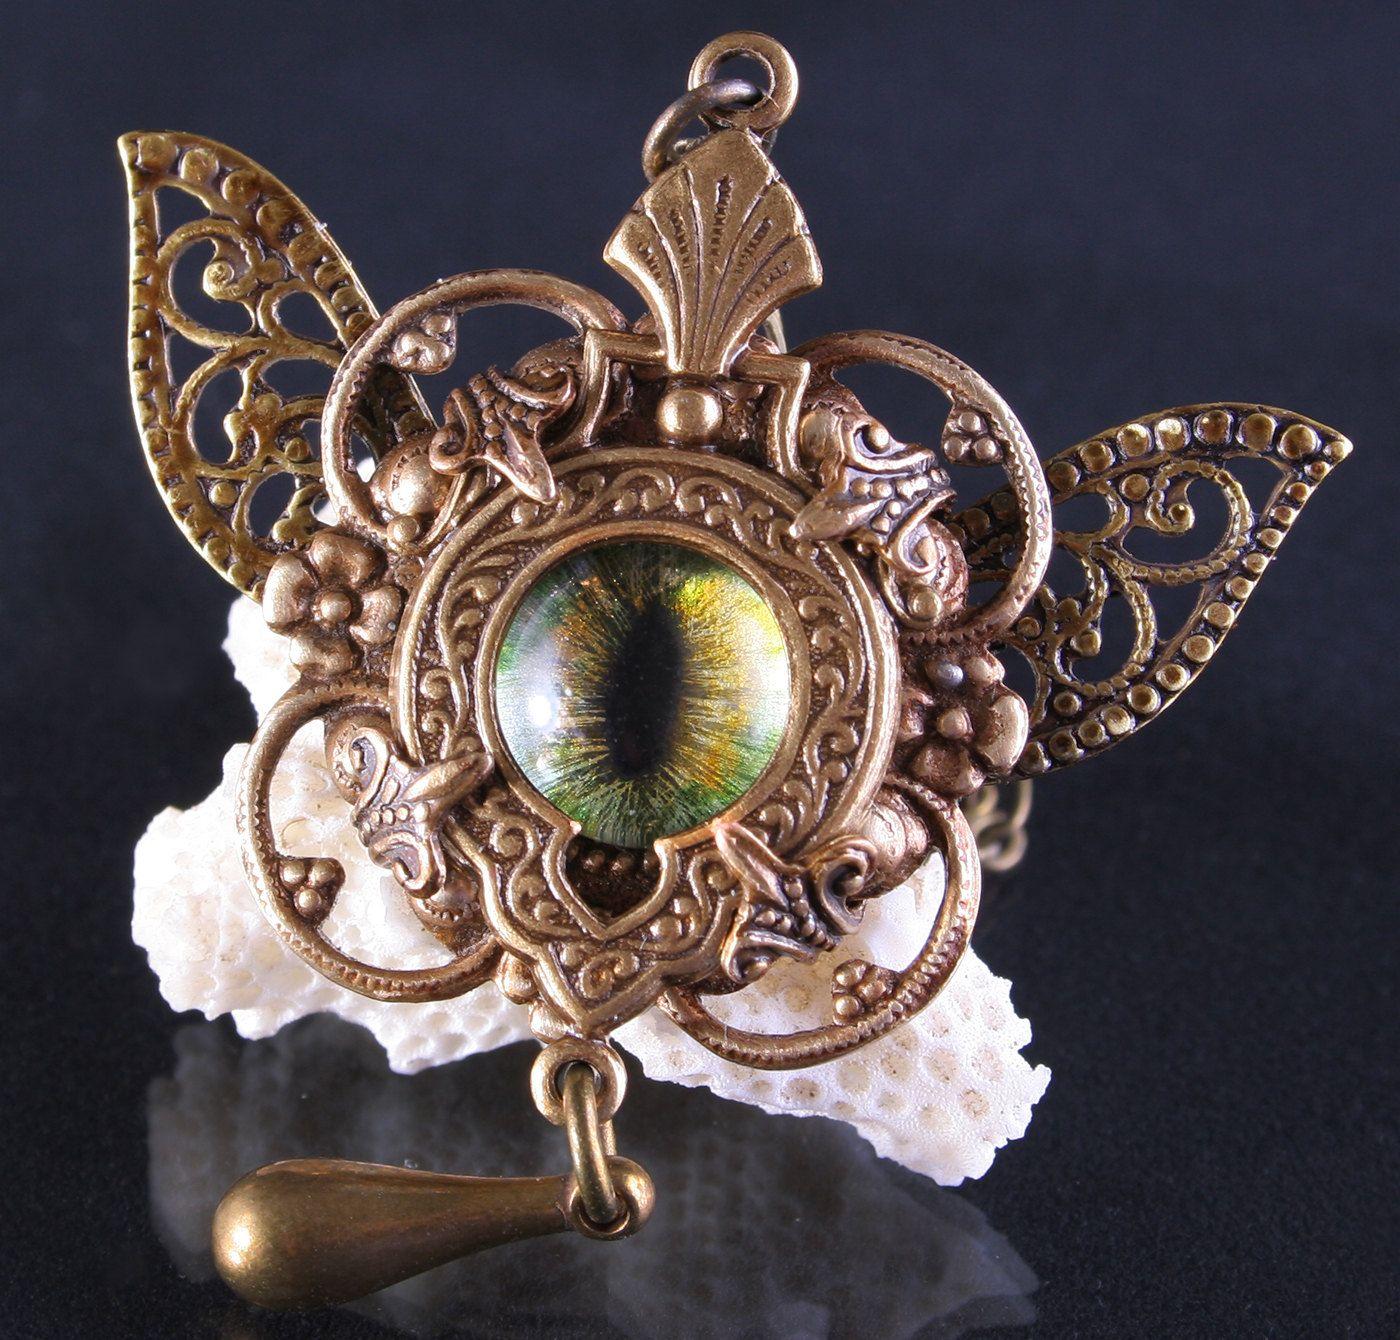 Gothic Steampunk Cat Evil Eye Necklace 44.99 #Evil #Eye #Necklace